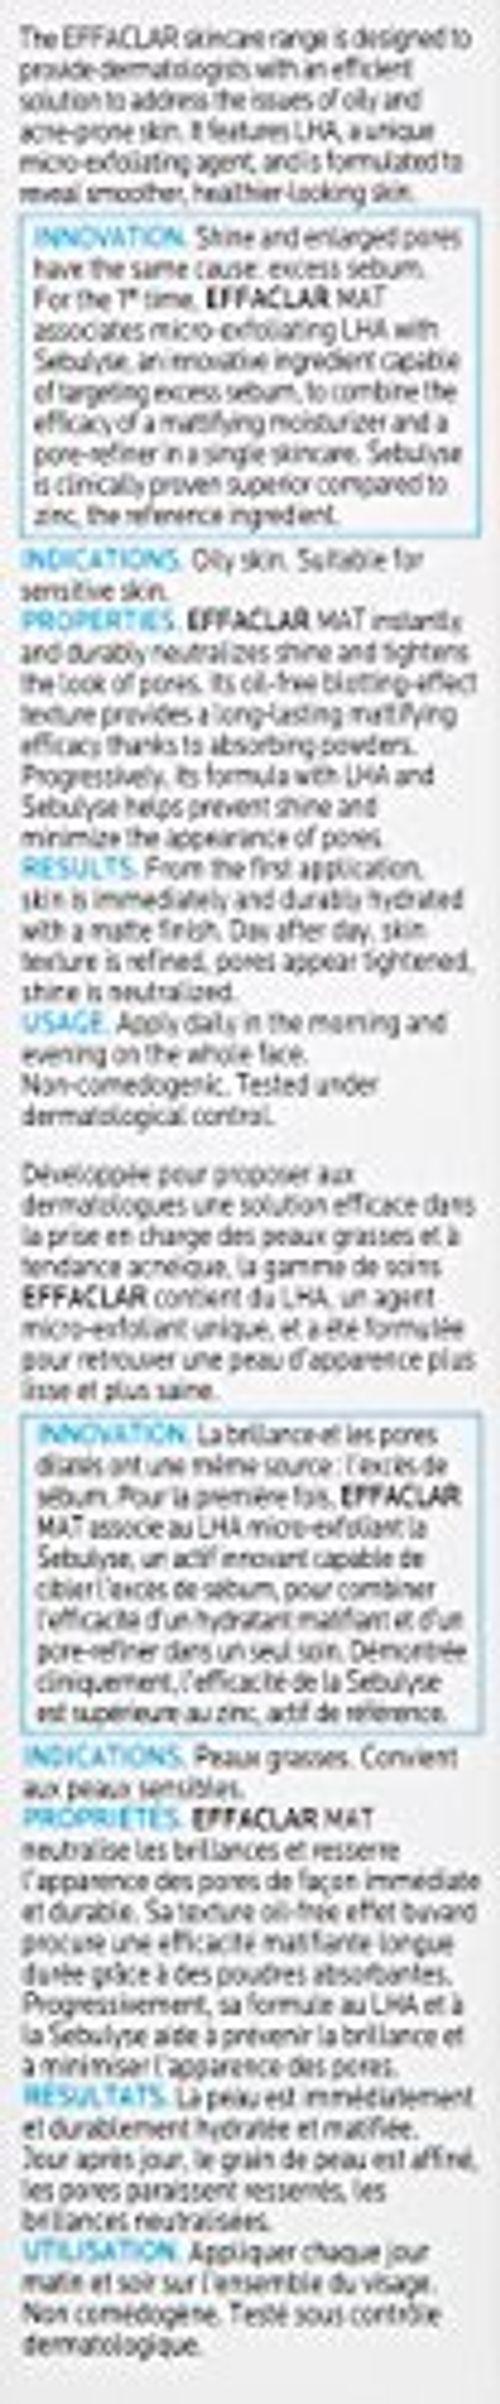 photo Wallpaper of La Roche-Posay-Roche Posay Effaclar Hidrat Matif Acti40-